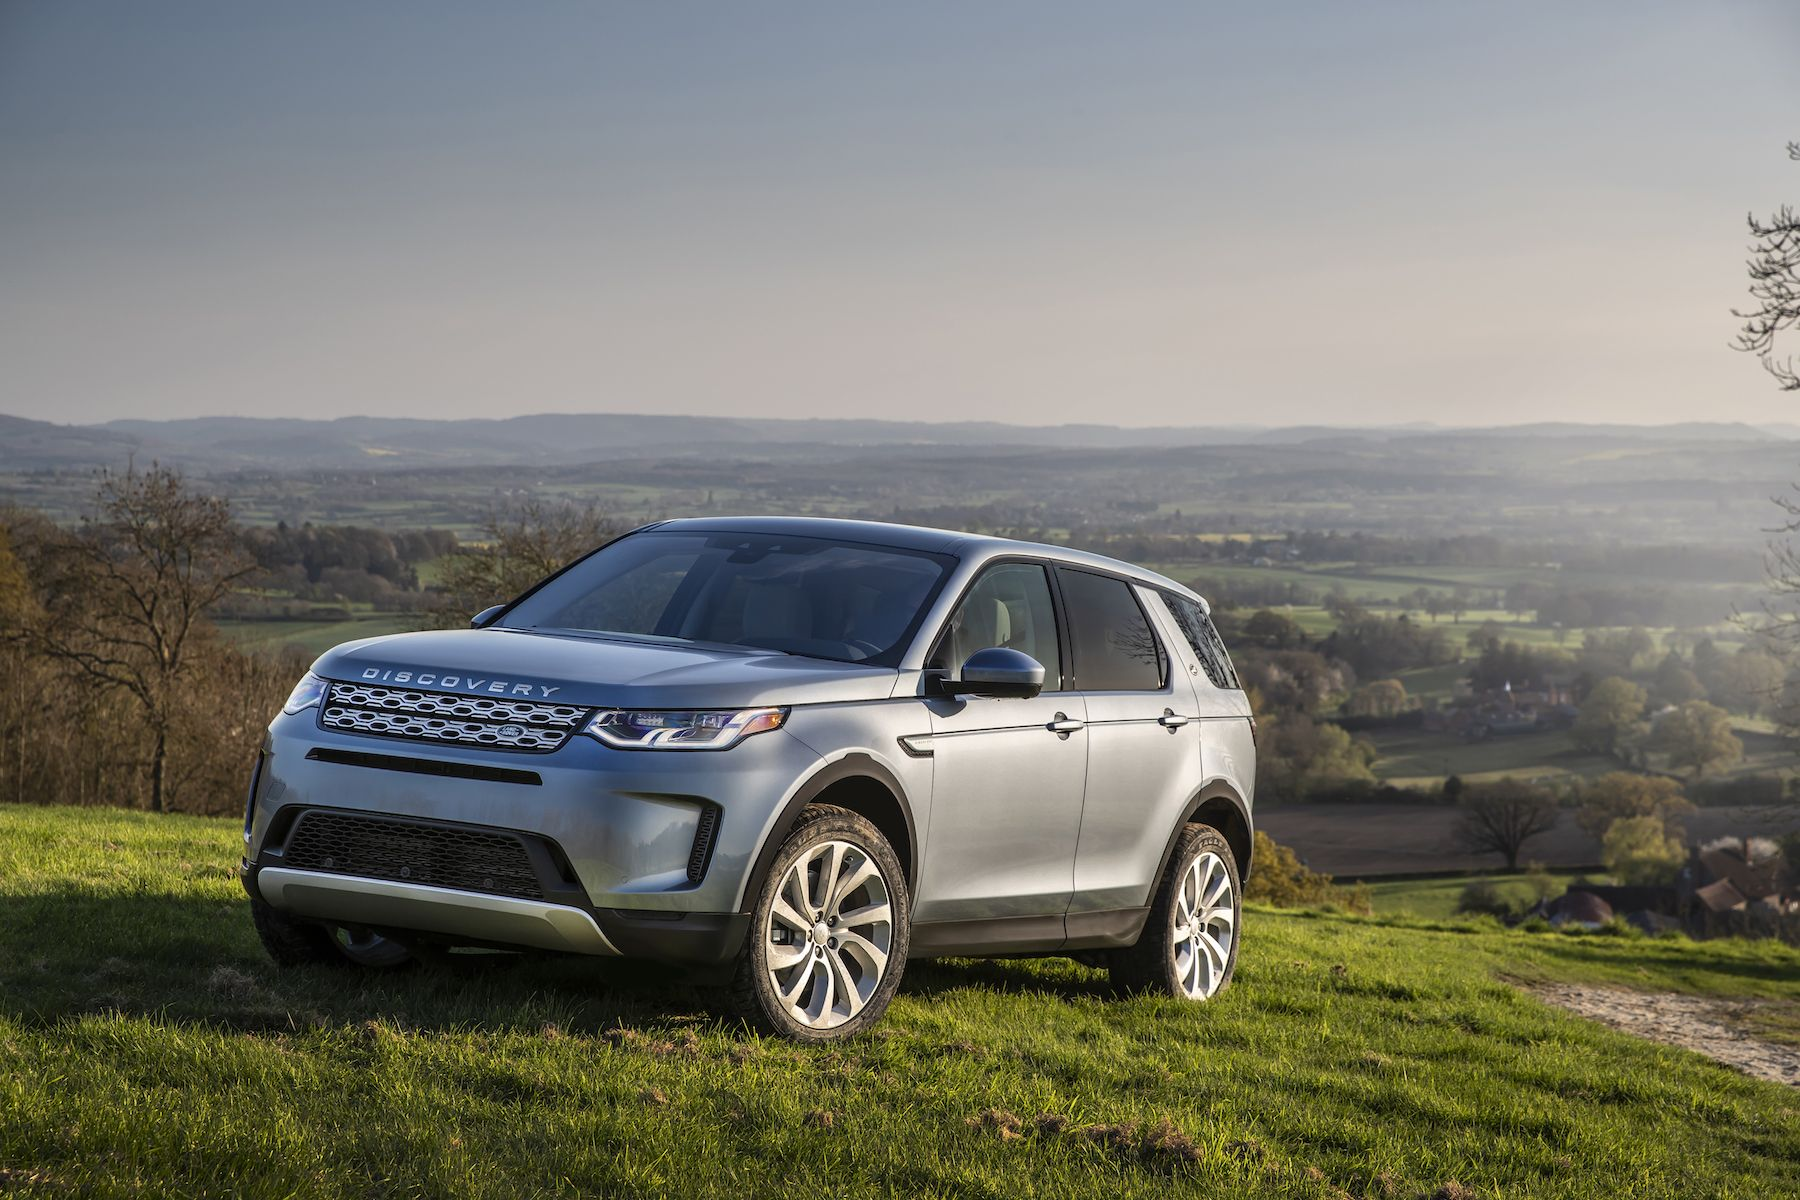 2019 Land Rover Discovery Sport: News, Design, Specs, Price >> 2020 Land Rover Discovery Sport Review Pricing And Specs